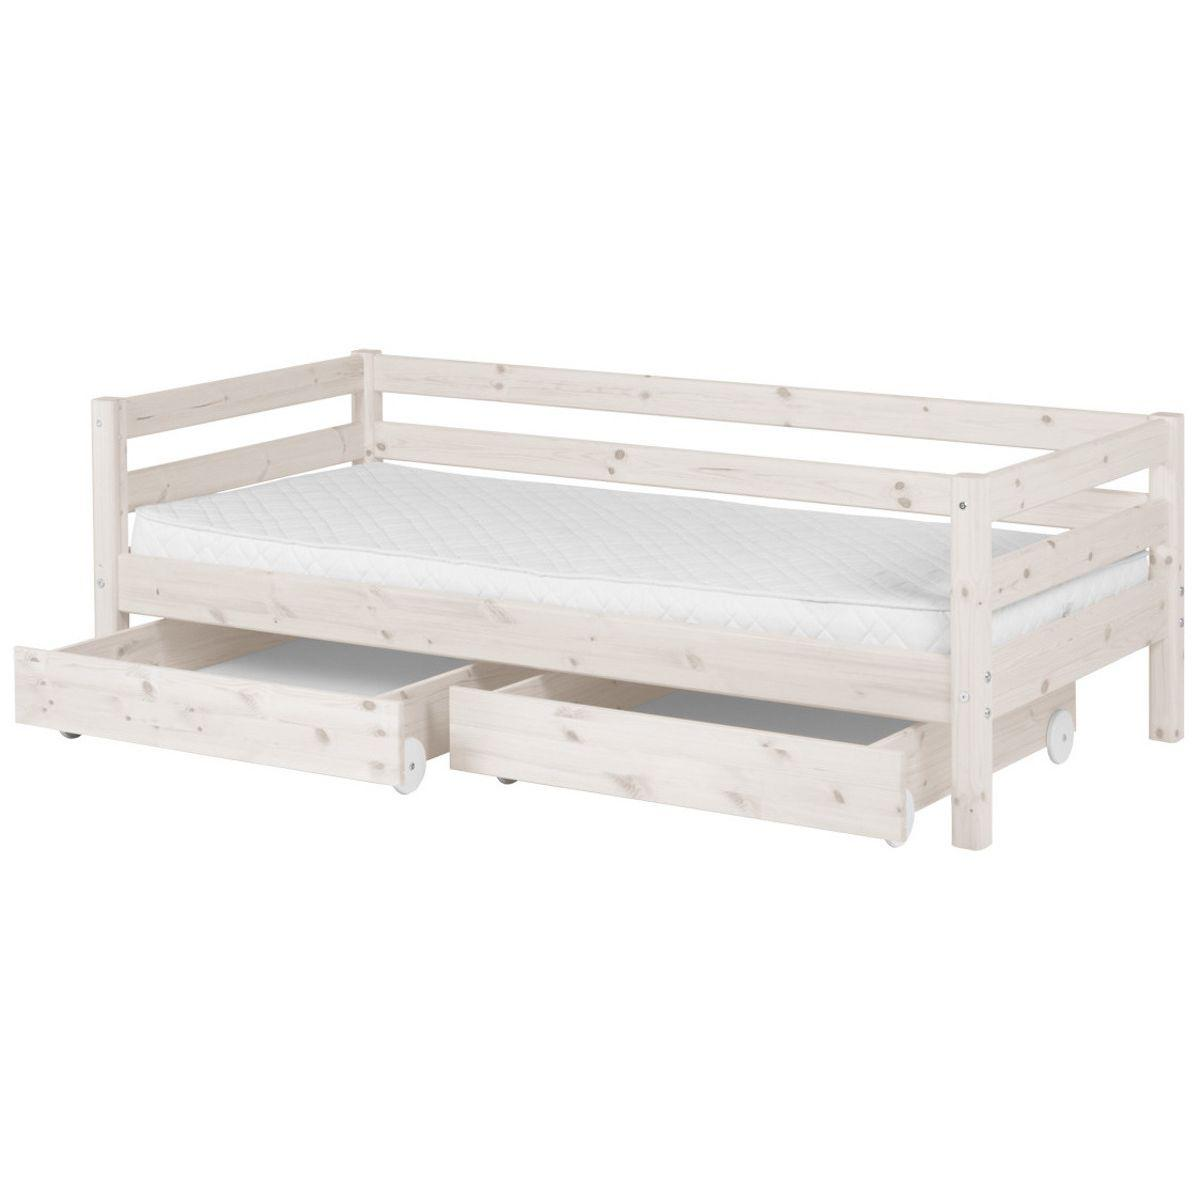 Set 2 cajones bajos Cama 190cm CLASSIC Flexa blanco cal